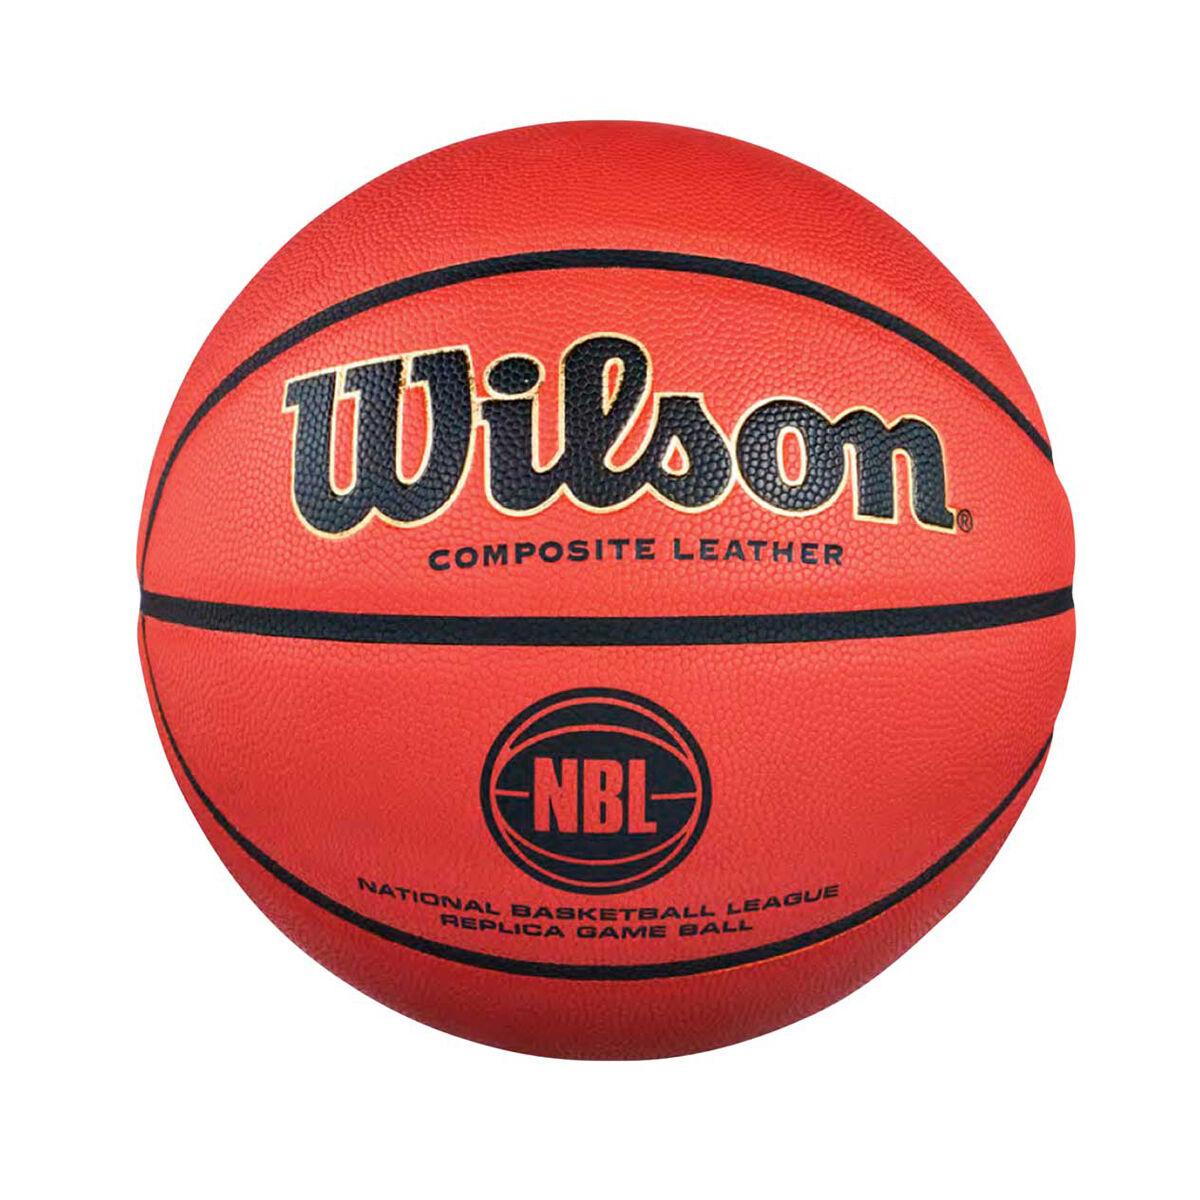 Wilson NBL REPLICA BASKETBALL Size-7 Indoor /& Outdoor Moisture Absorbing Cover